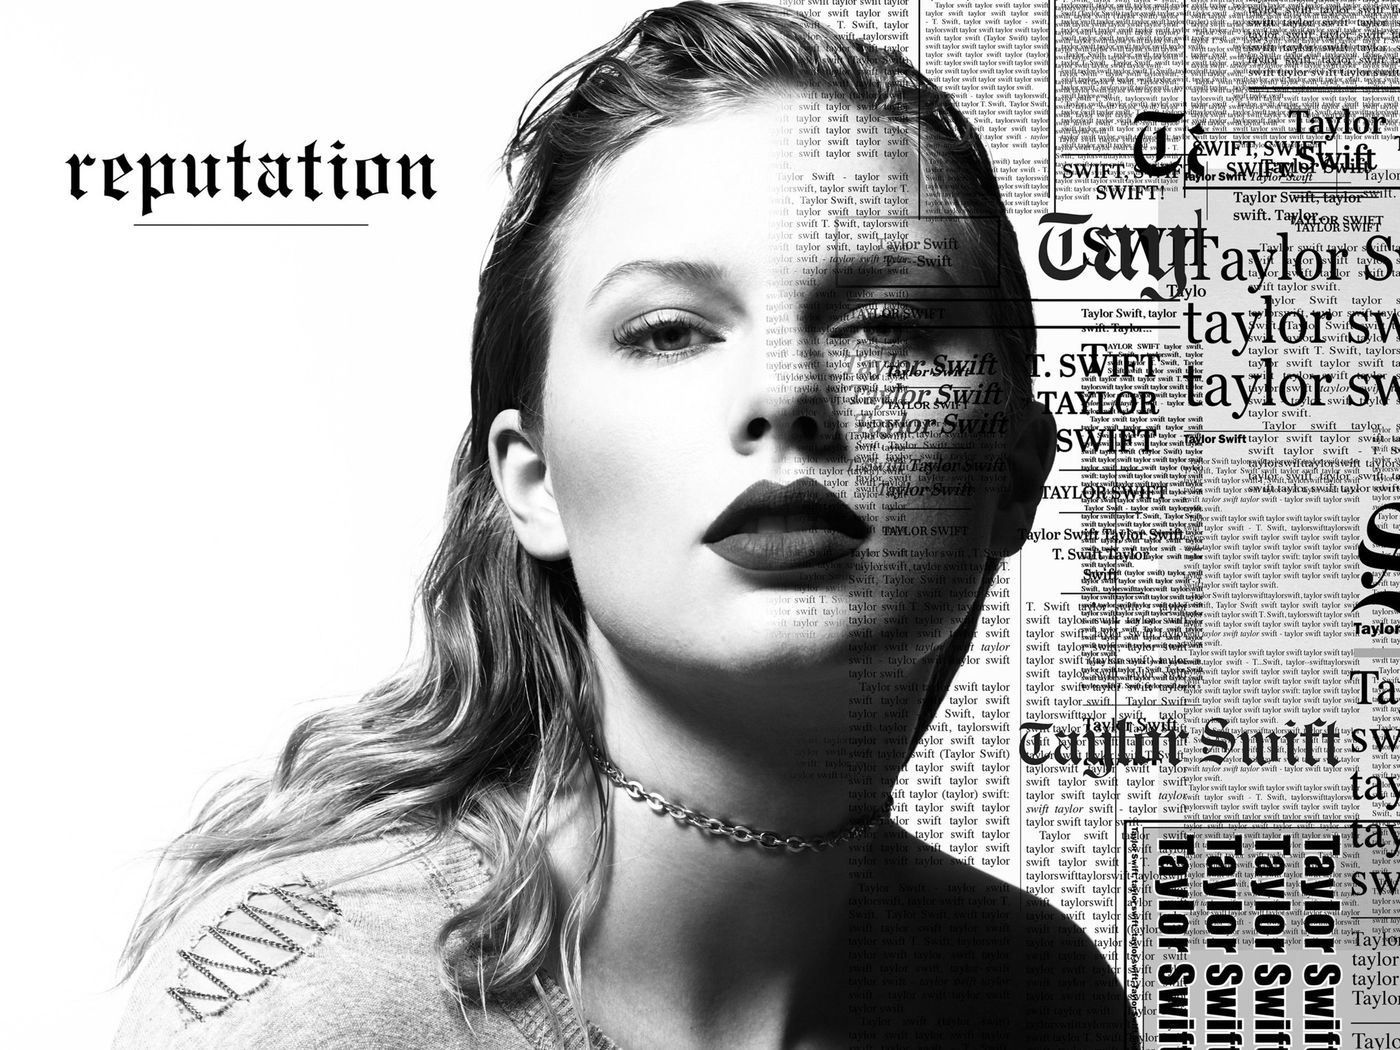 Canción 23 Reputation Taylor Swift álbum Frases